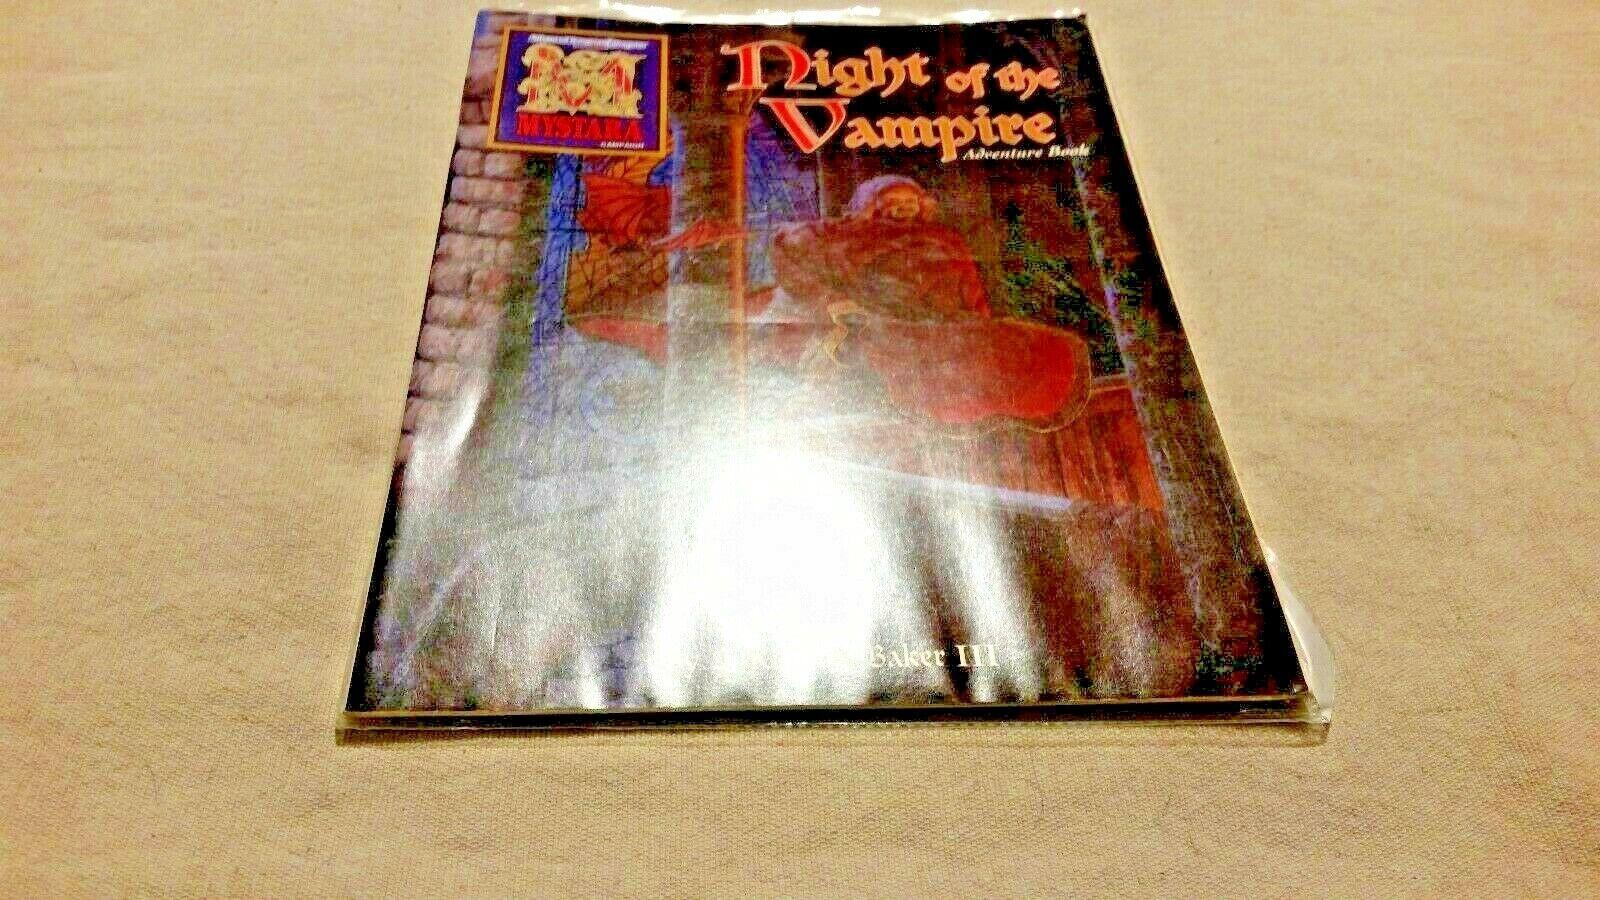 Mystara campaing Night of the Vampire Advanced Dungeons & dragons